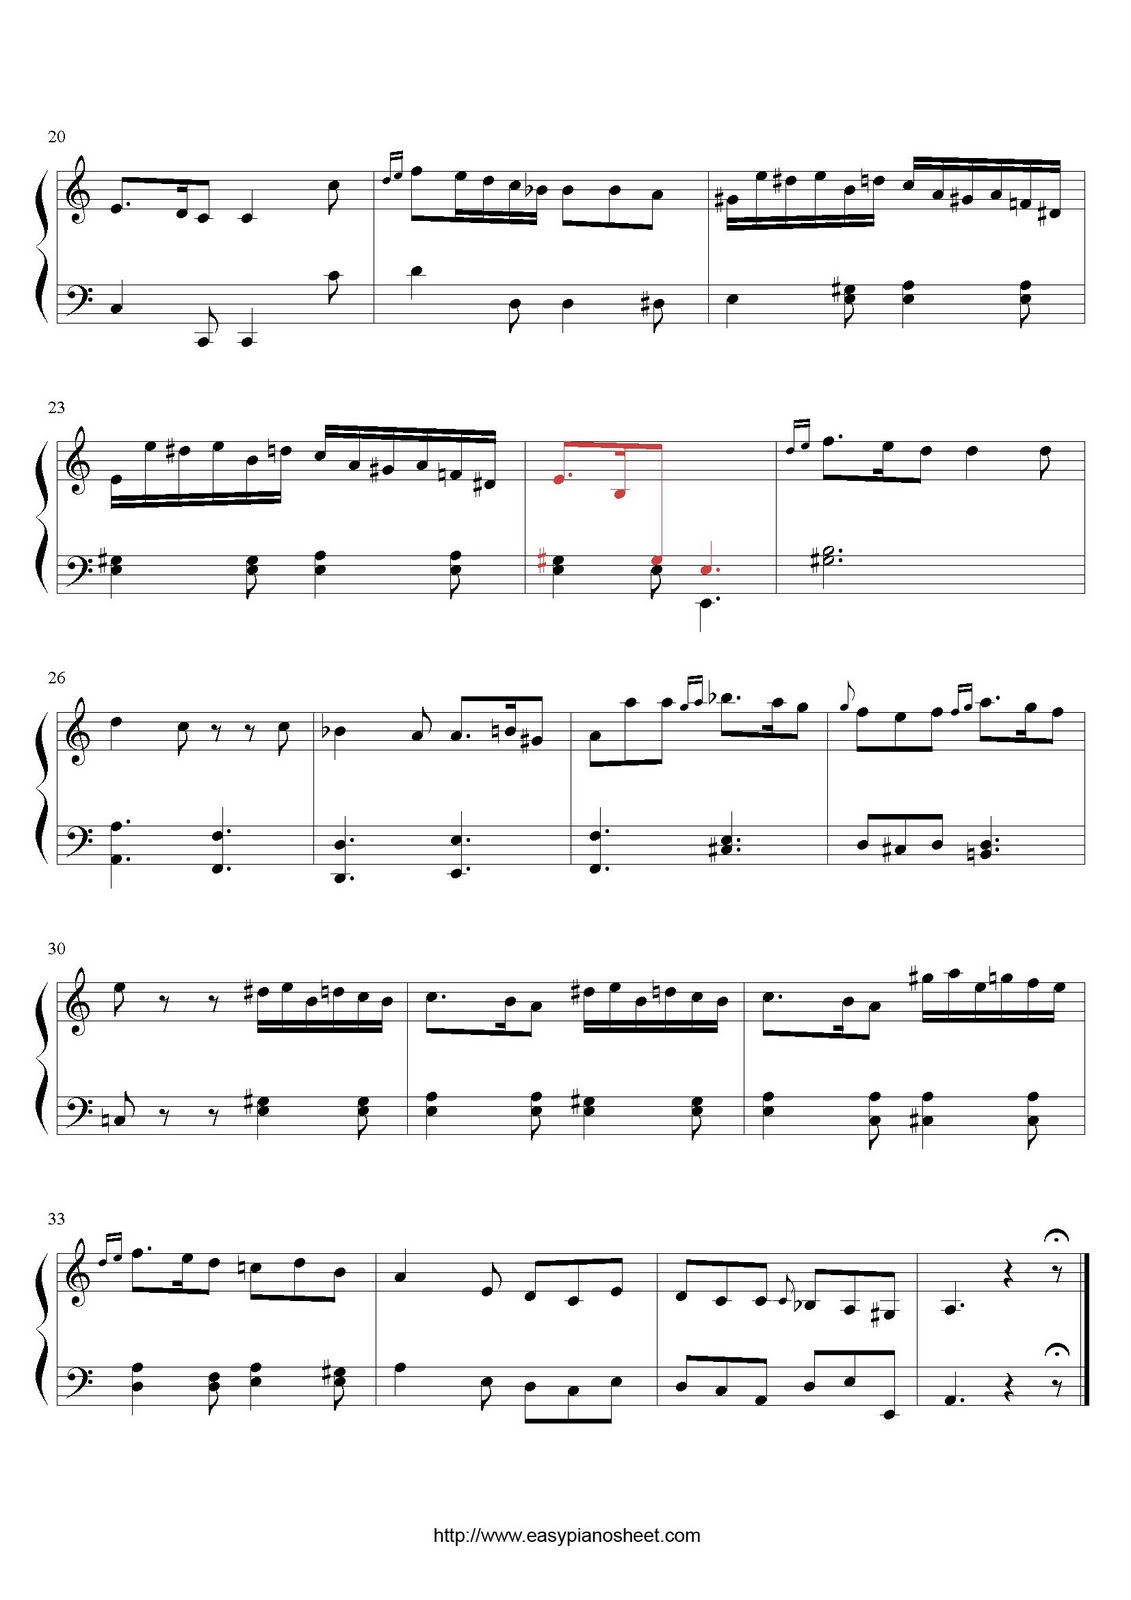 Partitura de piano gratis de Domenico Cimarosa: Sonata